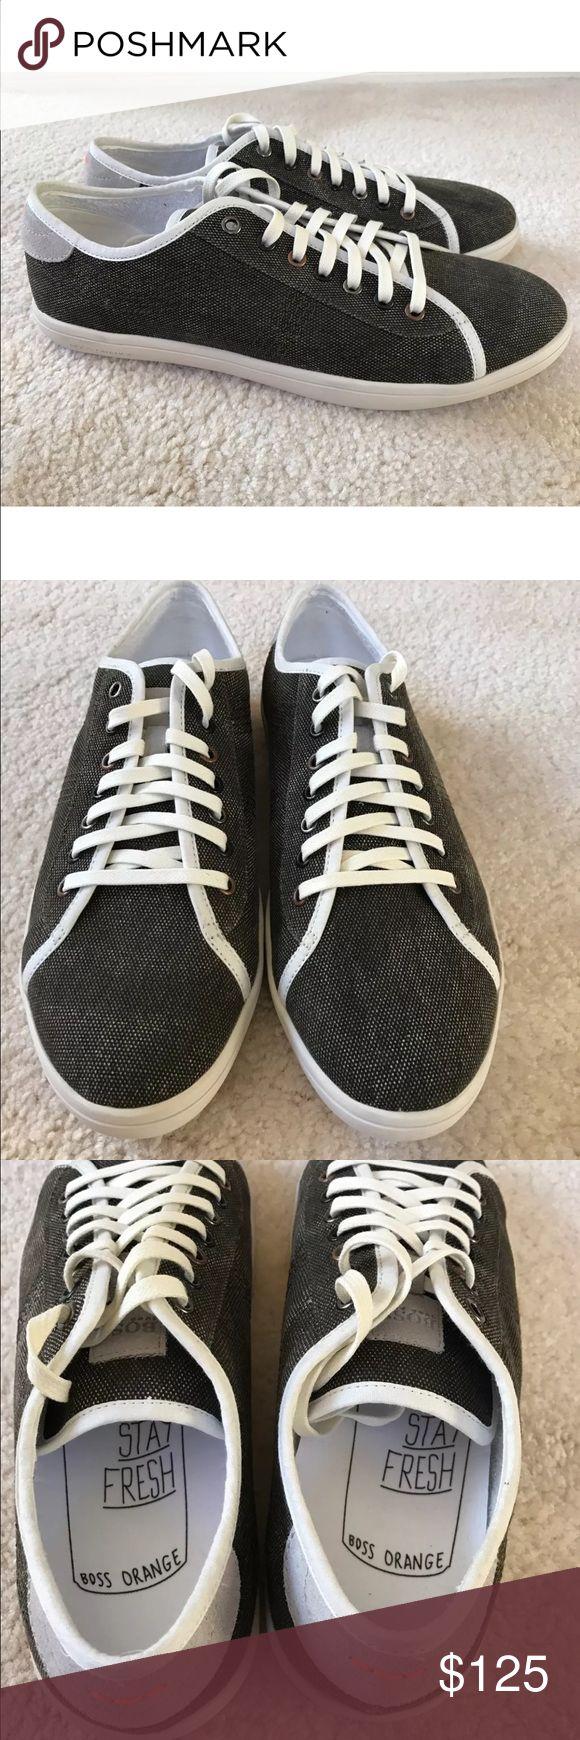 Hugo Boss Orange Men's Sneakers Dark Green Size 10 Hugo Boss Men's sneakers  Color: Dark green  Style: Soundex   100% authentic. New in original Hugo boss shoe box   Retail price at $175.00 SIZE: 10 US Hugo Boss Shoes Sneakers